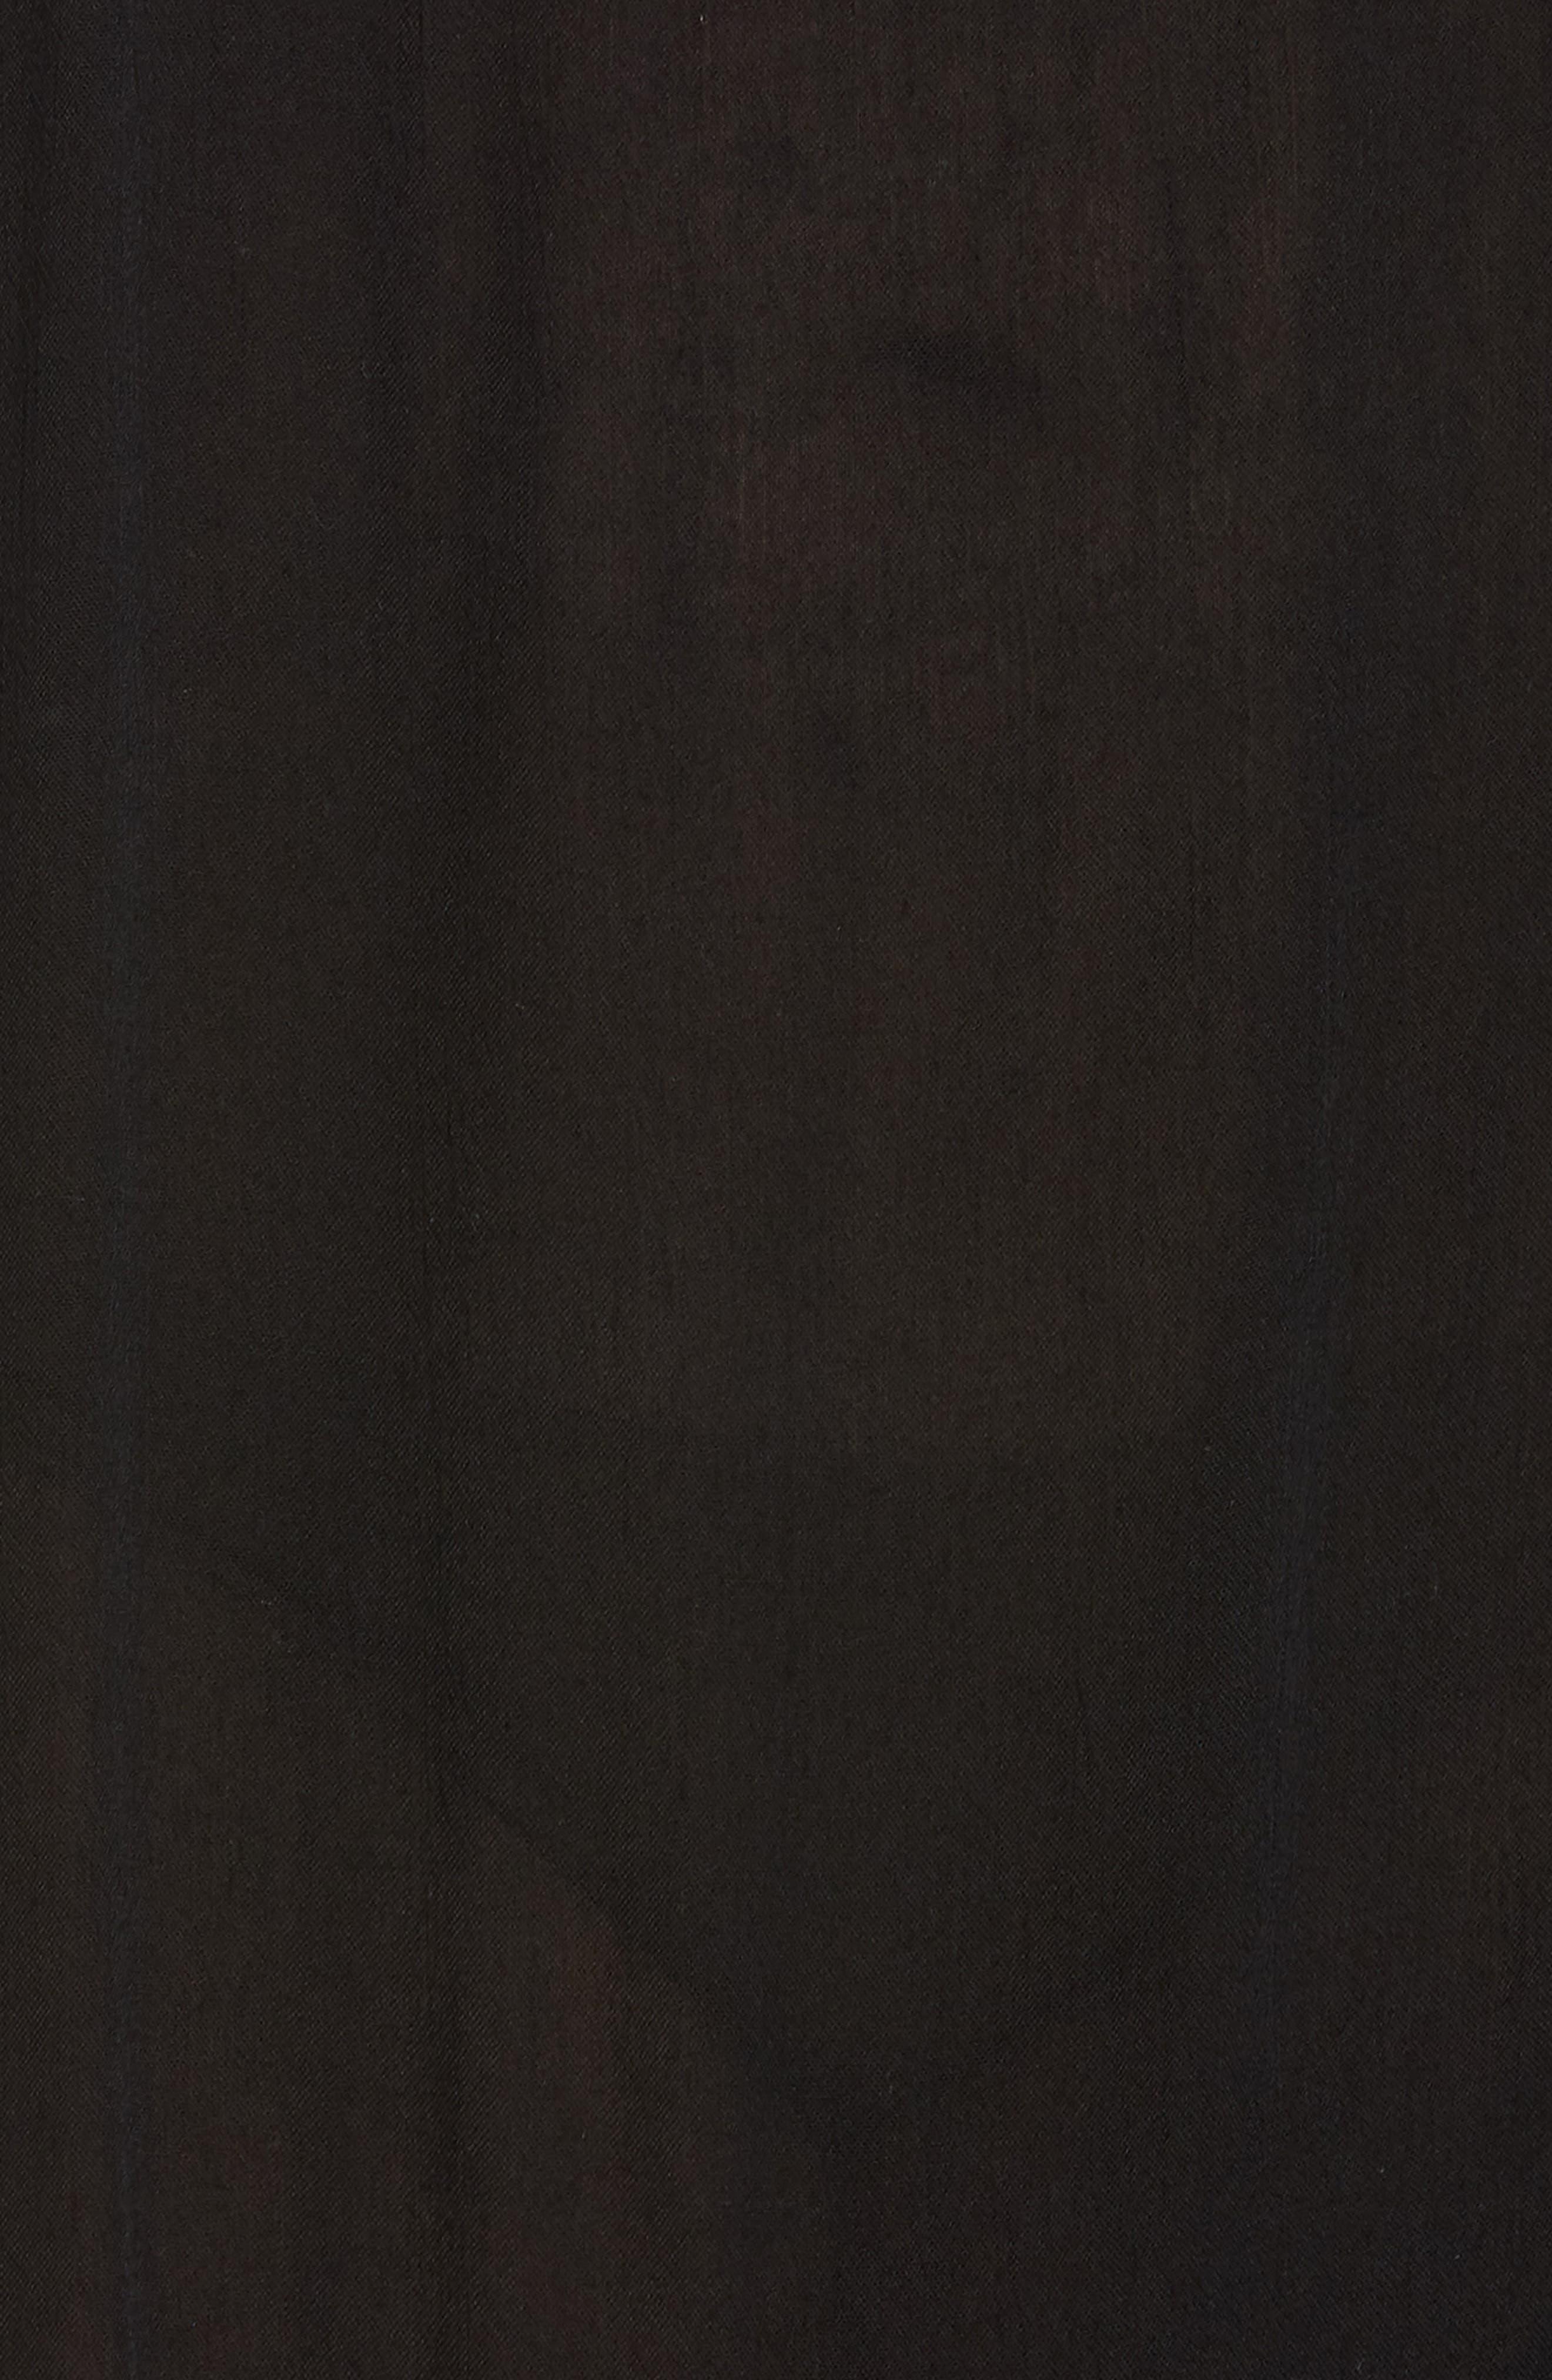 Gavin One-Shoulder Cover-Up Dress,                             Alternate thumbnail 5, color,                             002